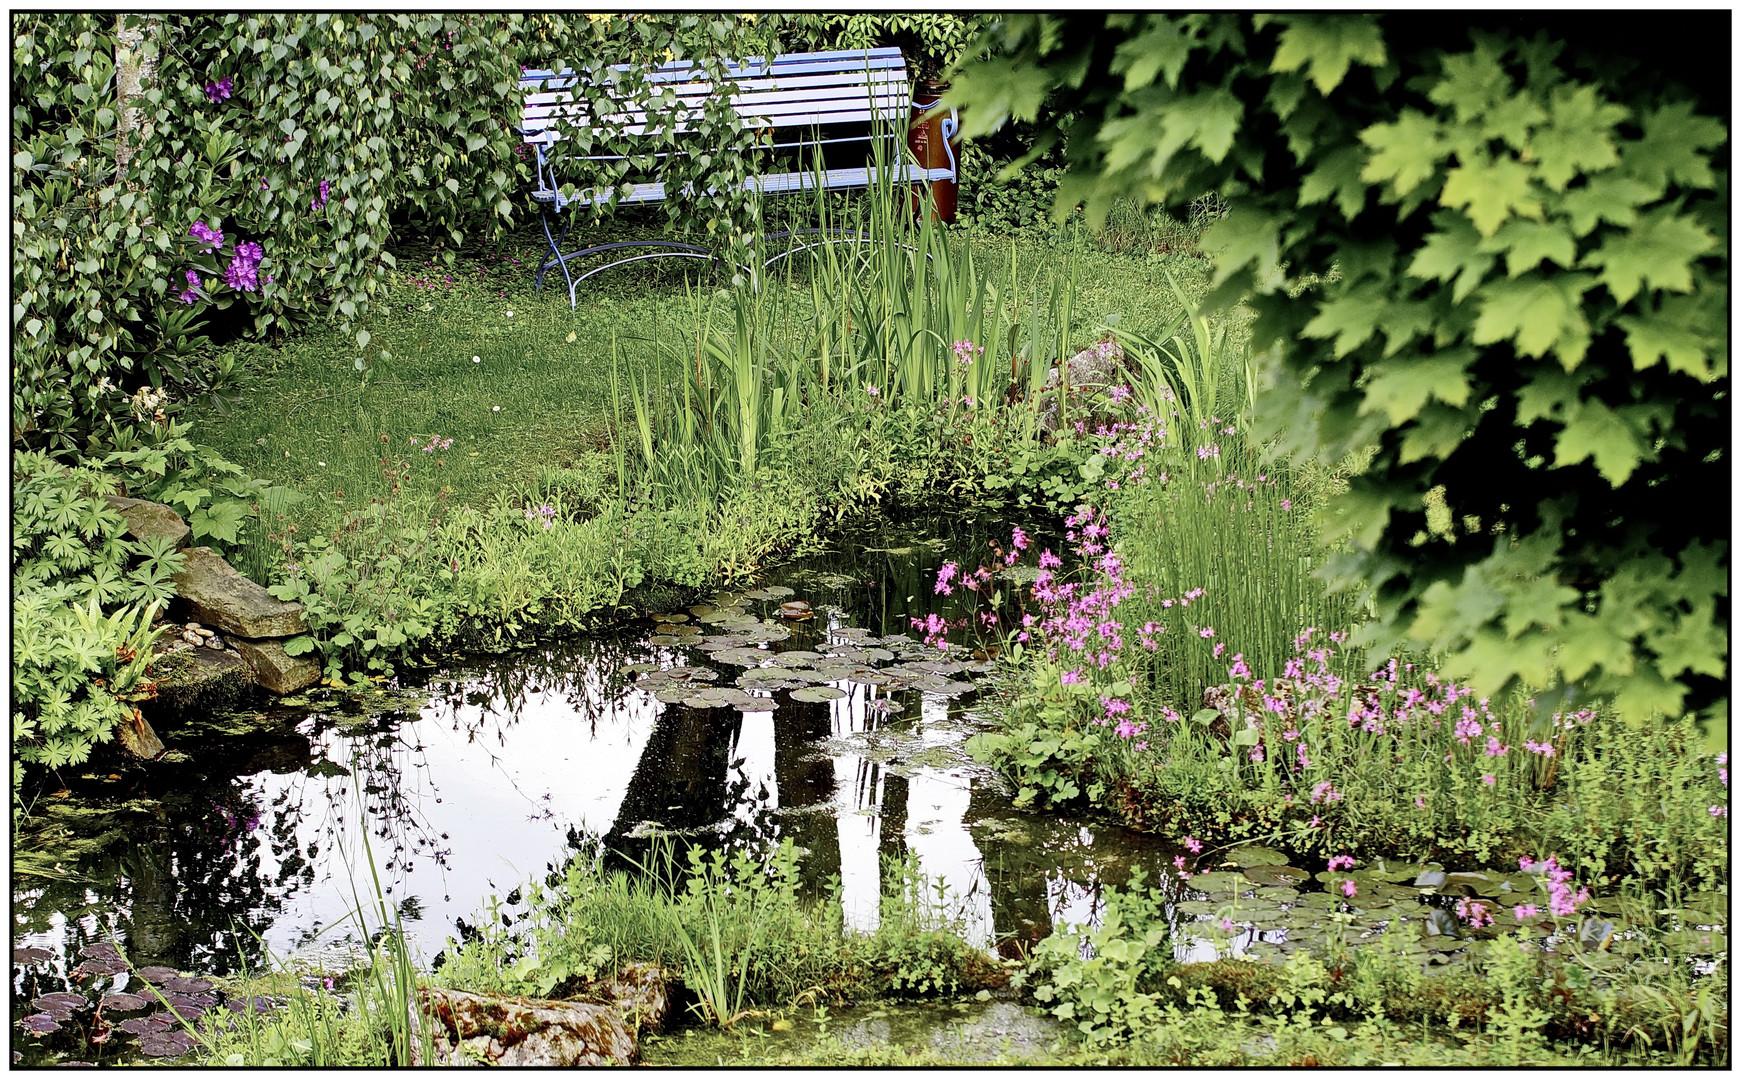 Gartenteich Ende Mai